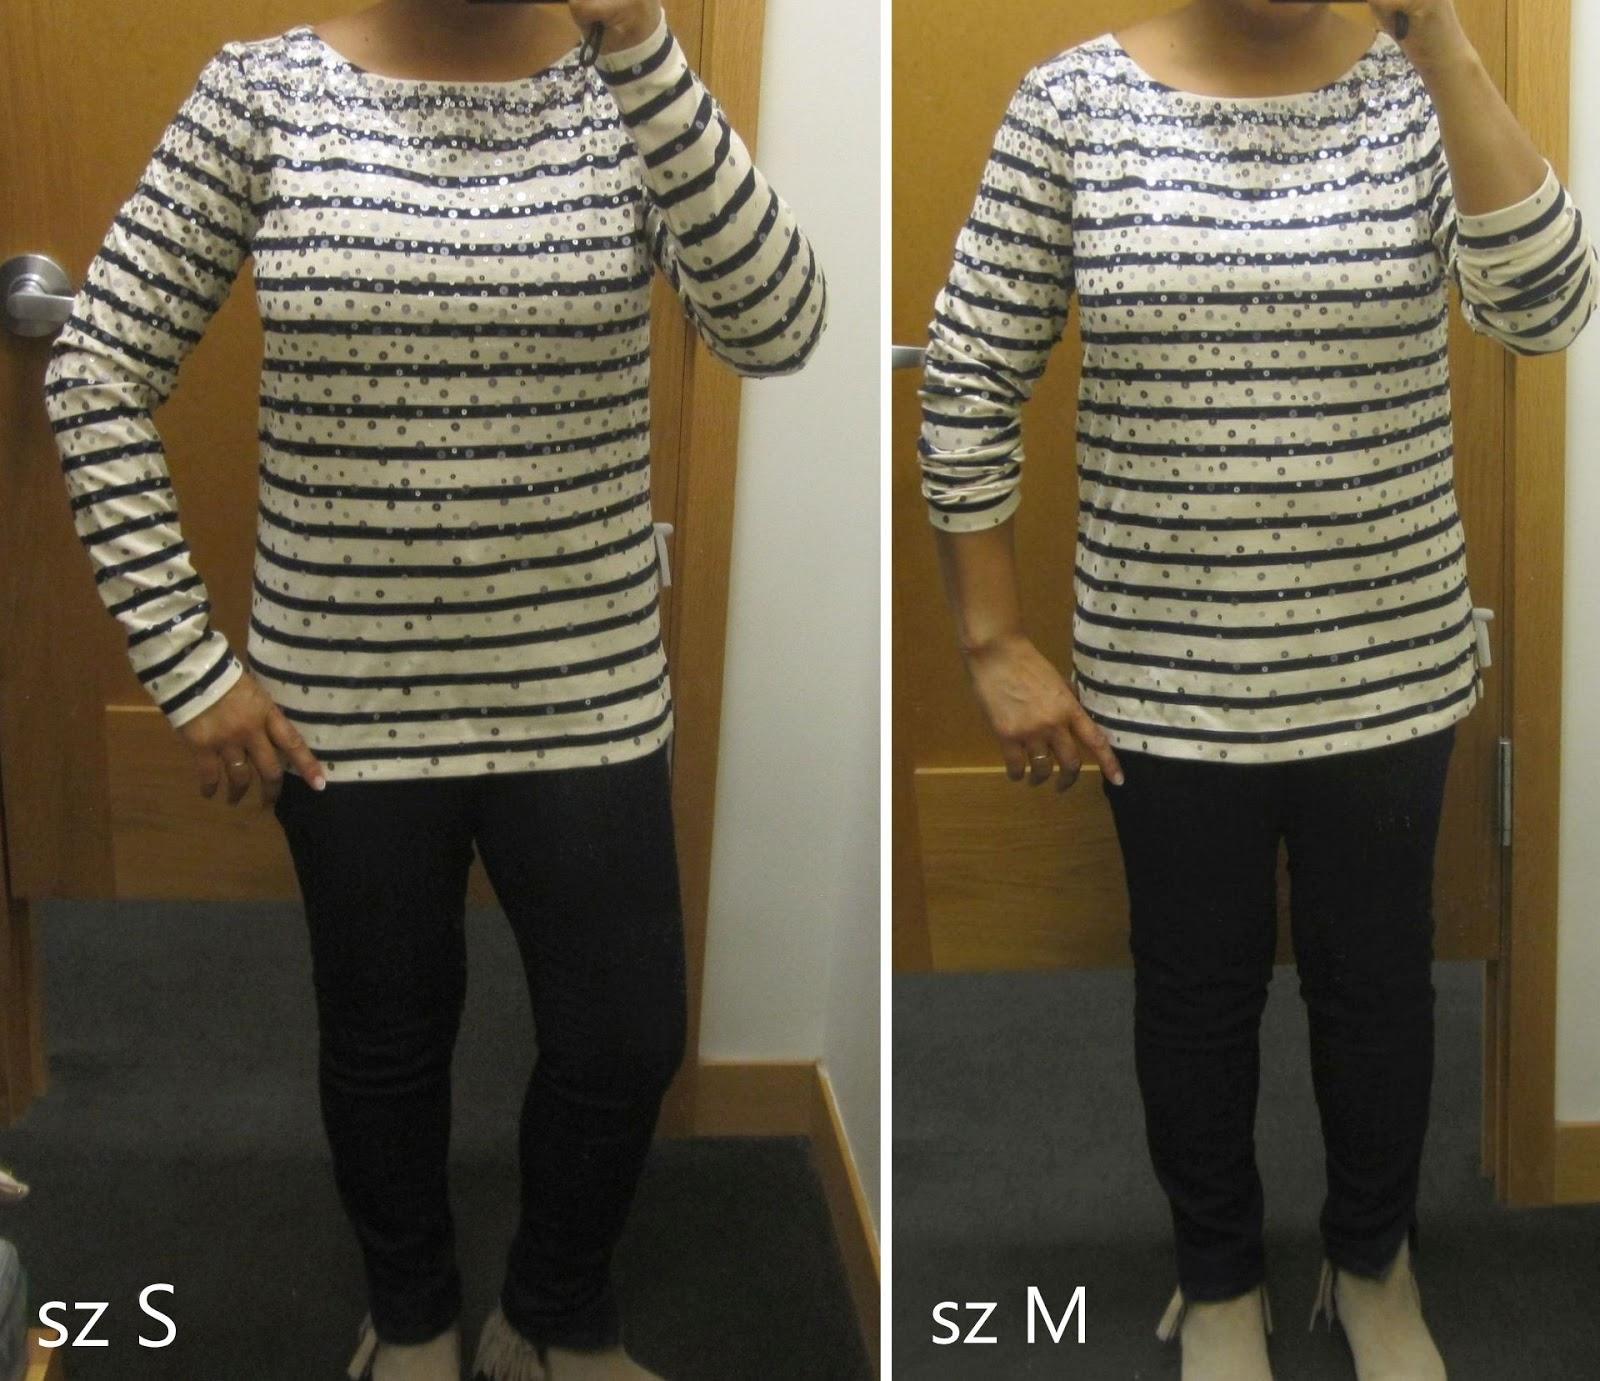 693e2441b98eb1 J Crew Factory confetti sequin tee   reviews - Gigi s Gone Shopping